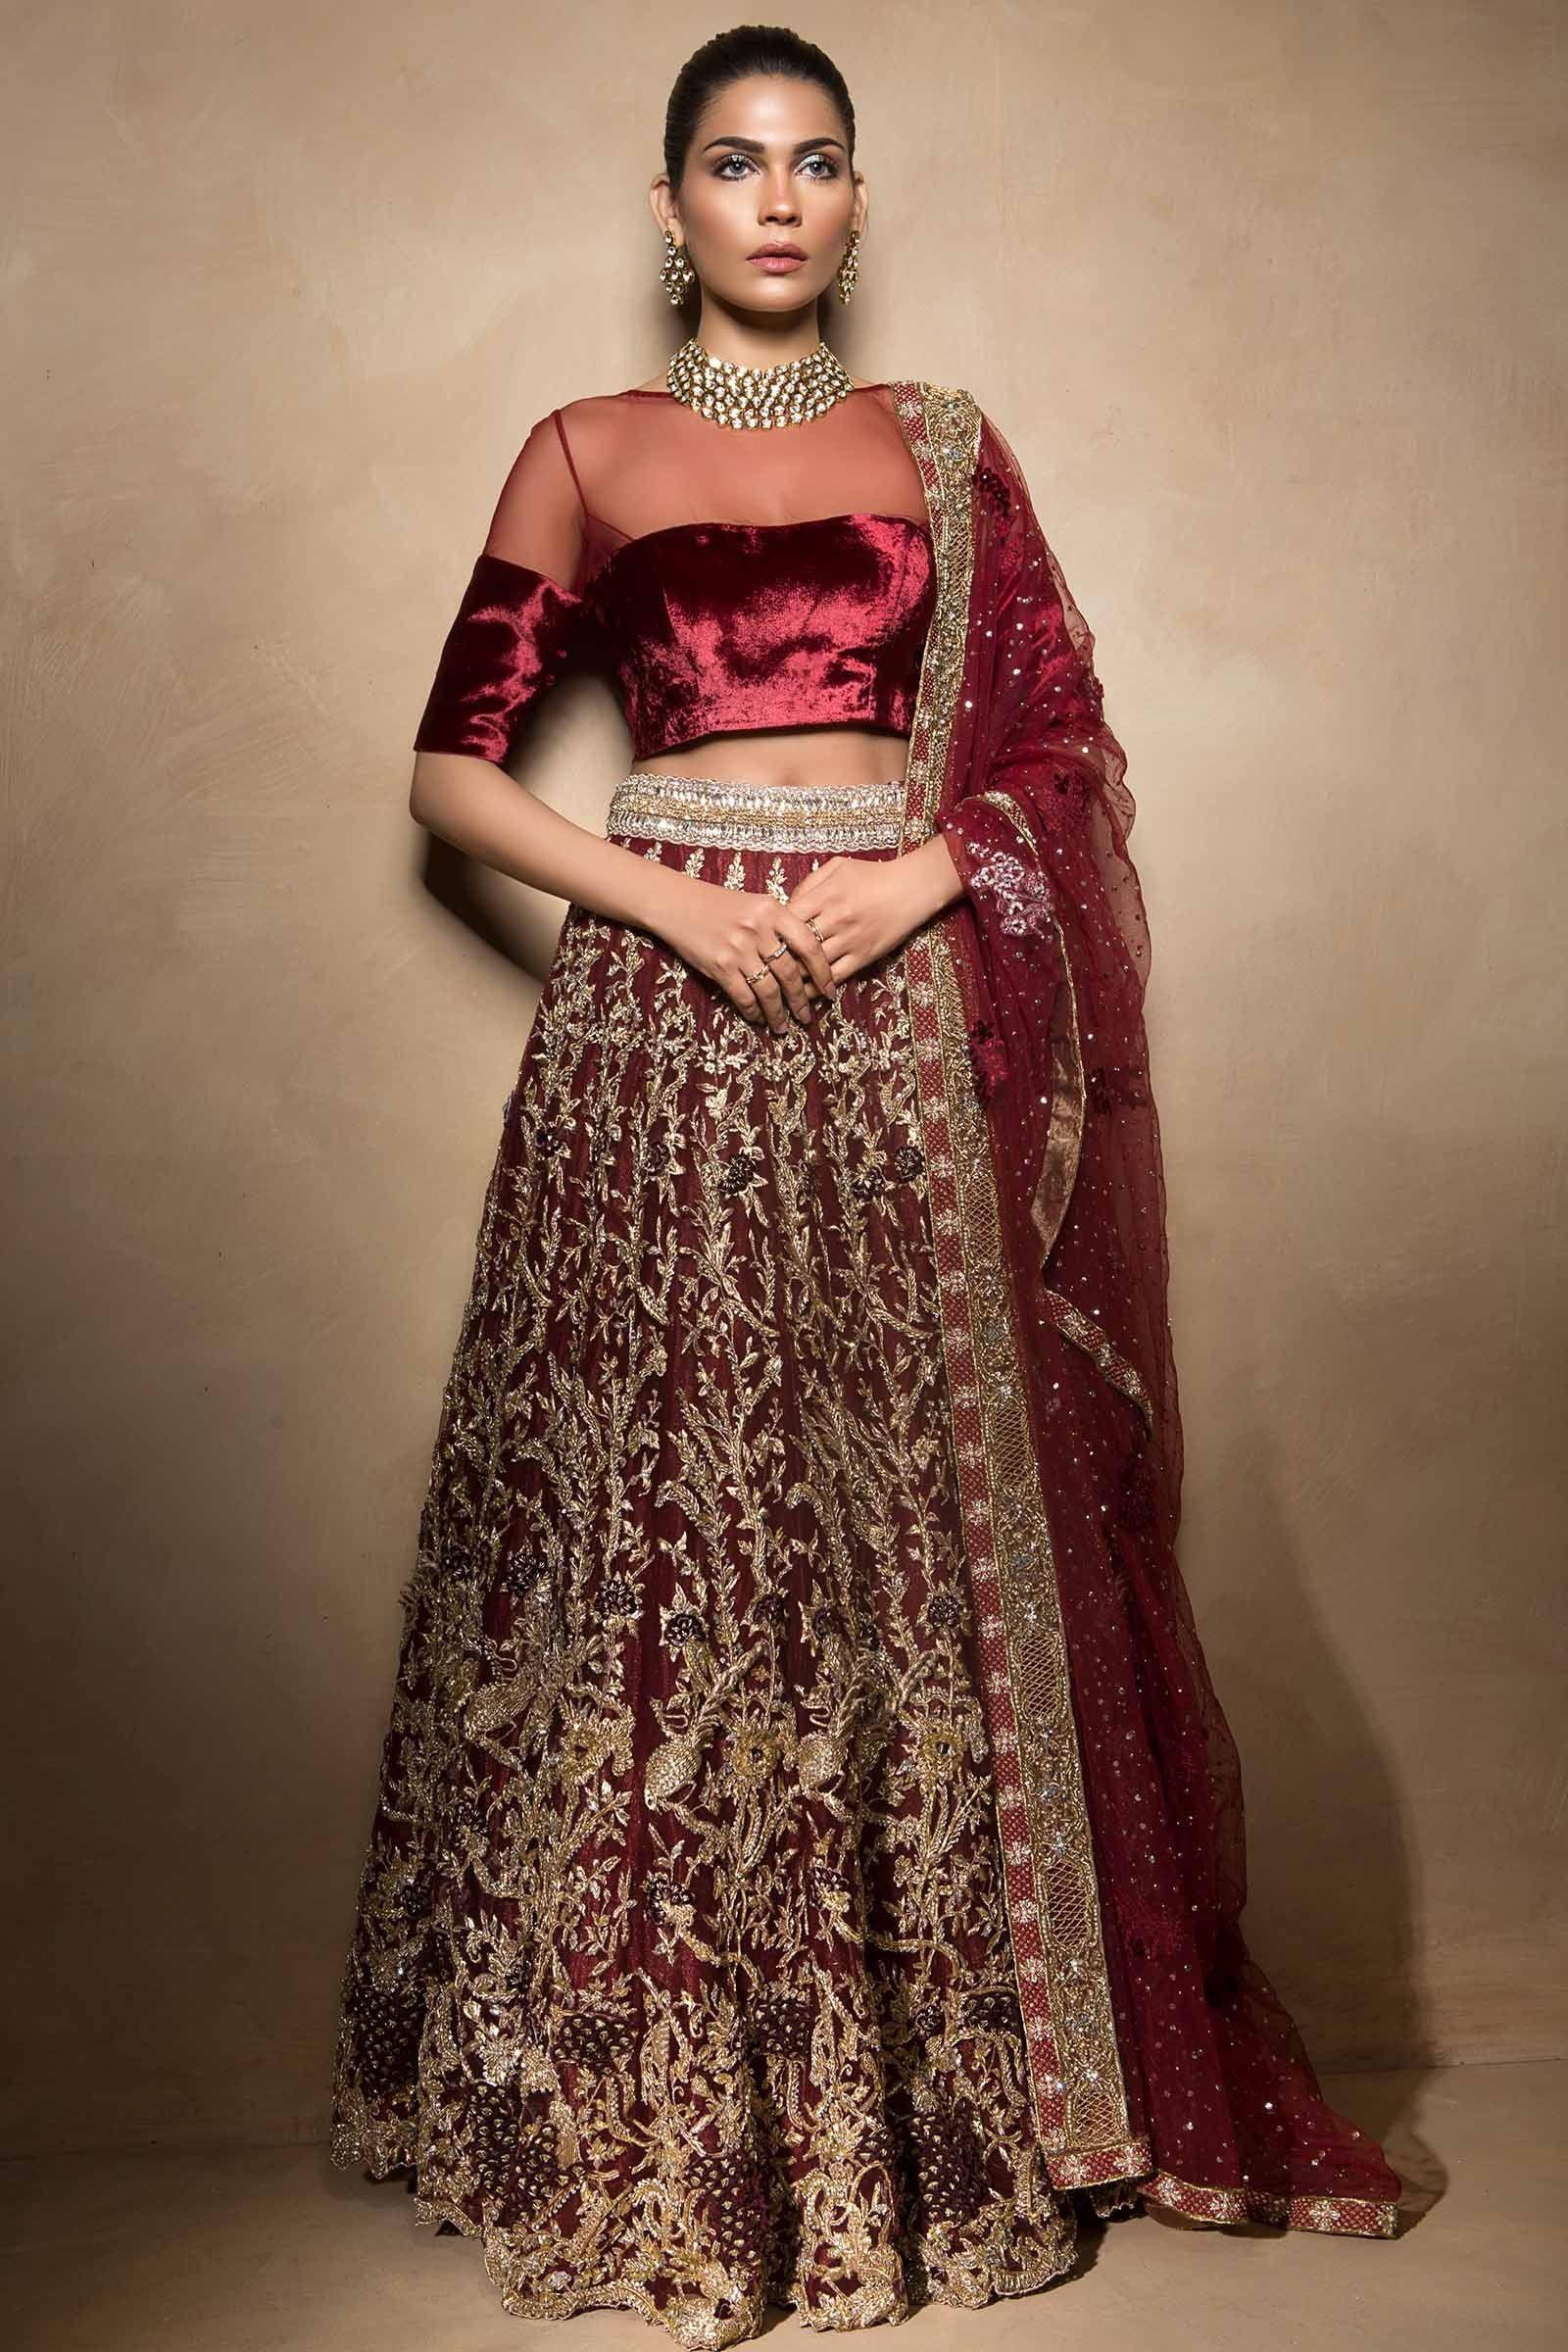 Mahgul bridal lengha Pakistani dress design, Pakistani